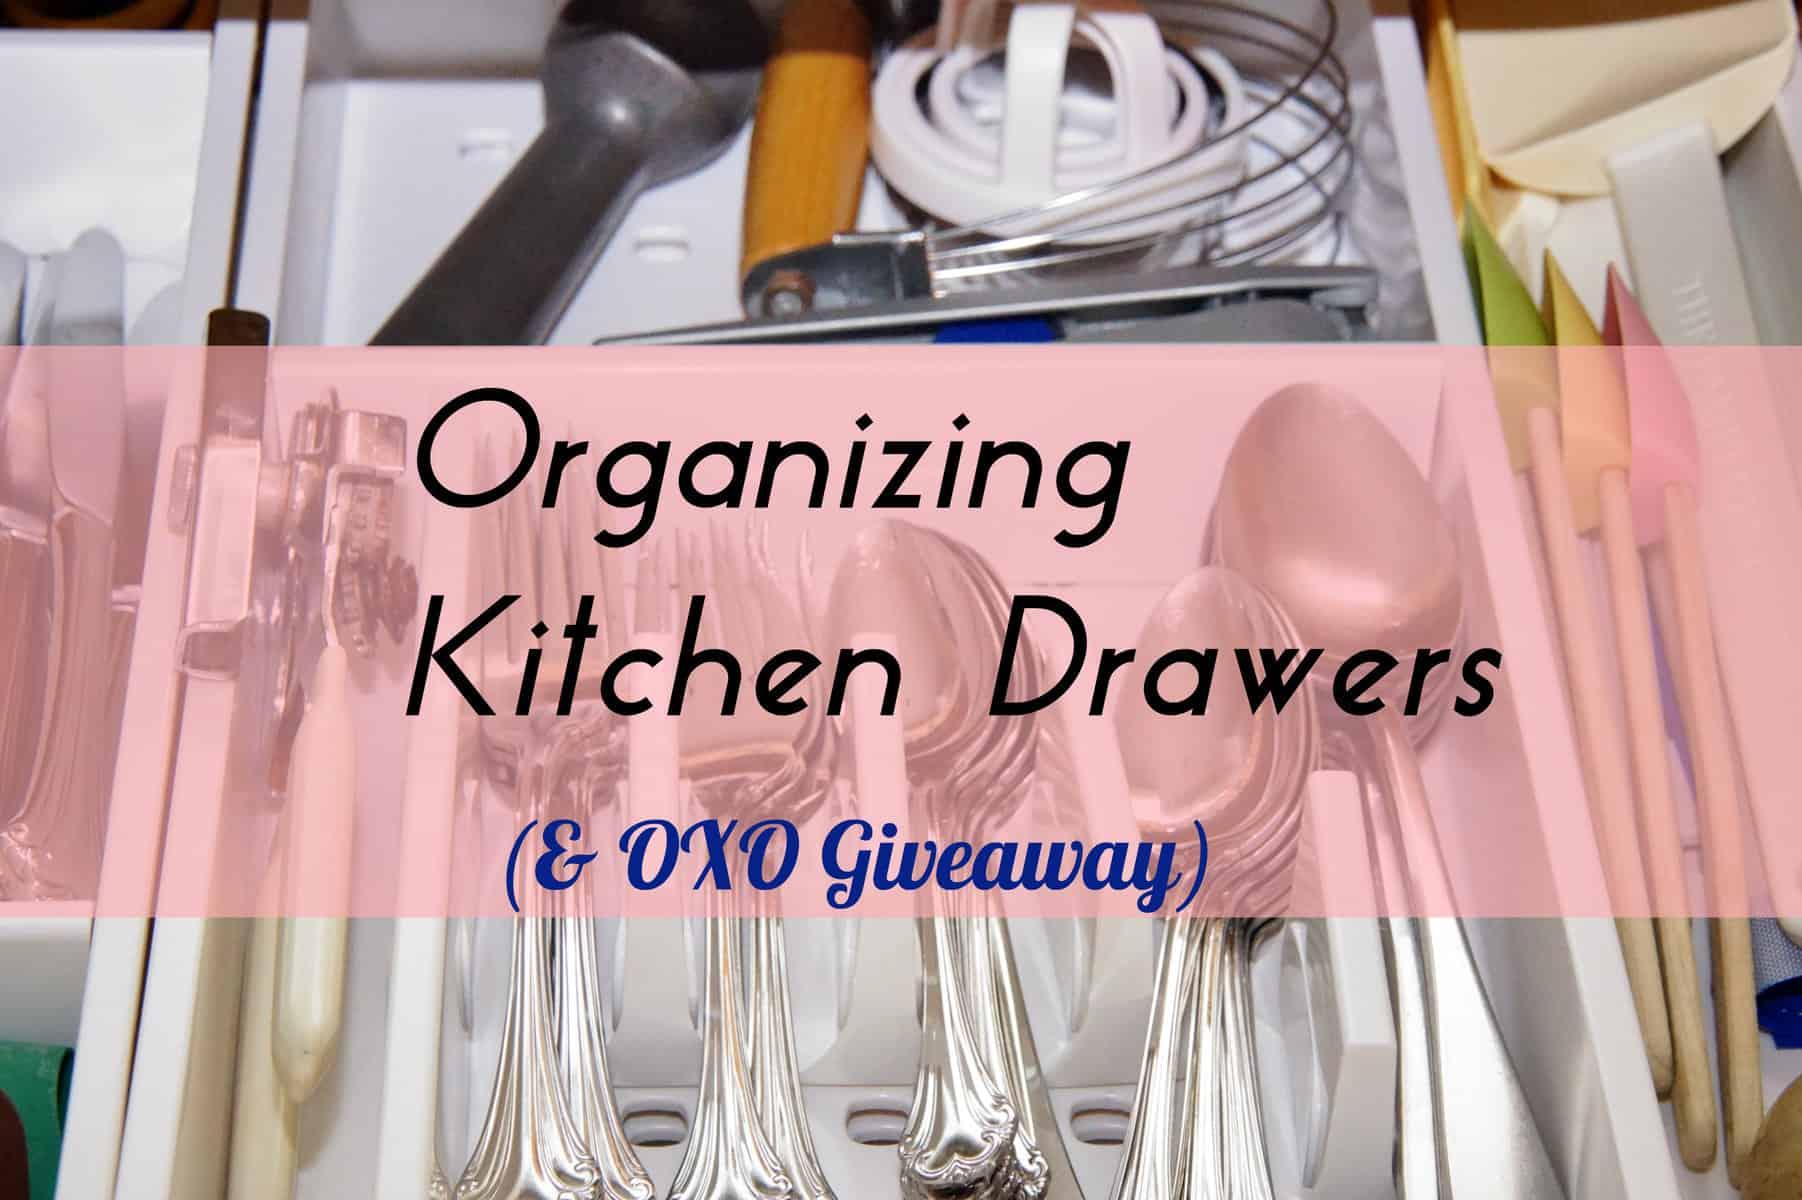 Organizing kitchen drawers giveaway heartwork organizing tips organize kitchen drawer and clutter workwithnaturefo